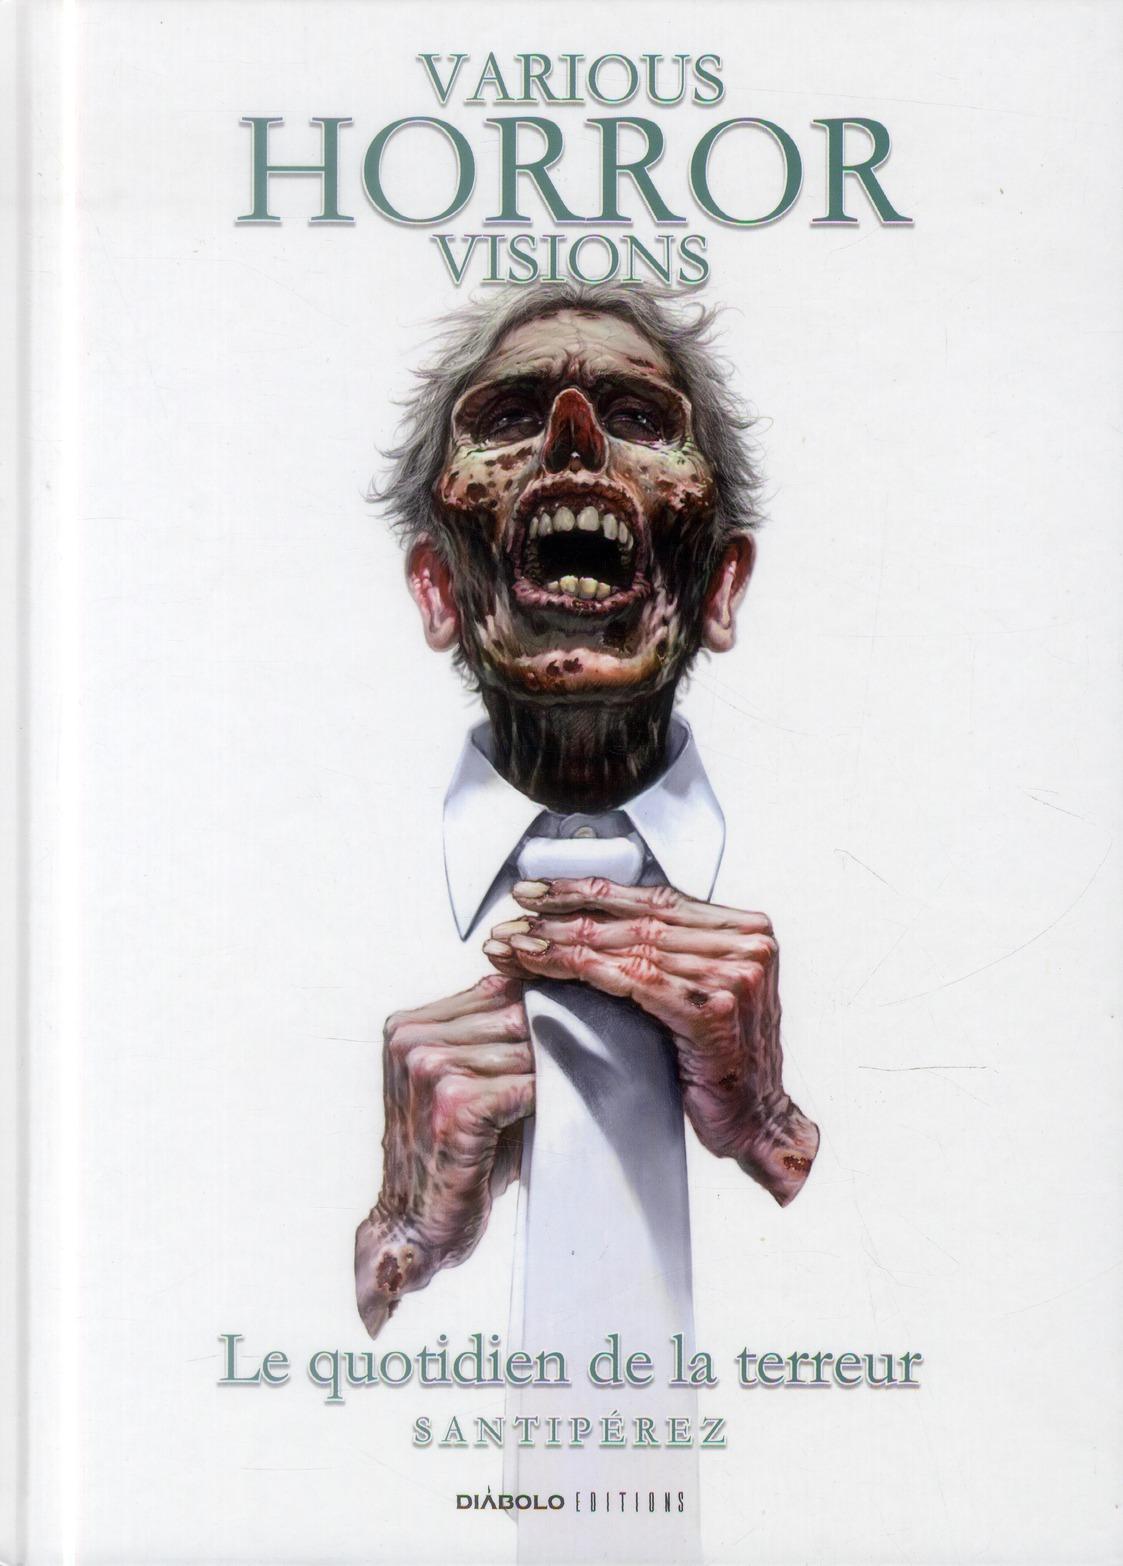 Varius horror visions ; le quotidien de la terreur